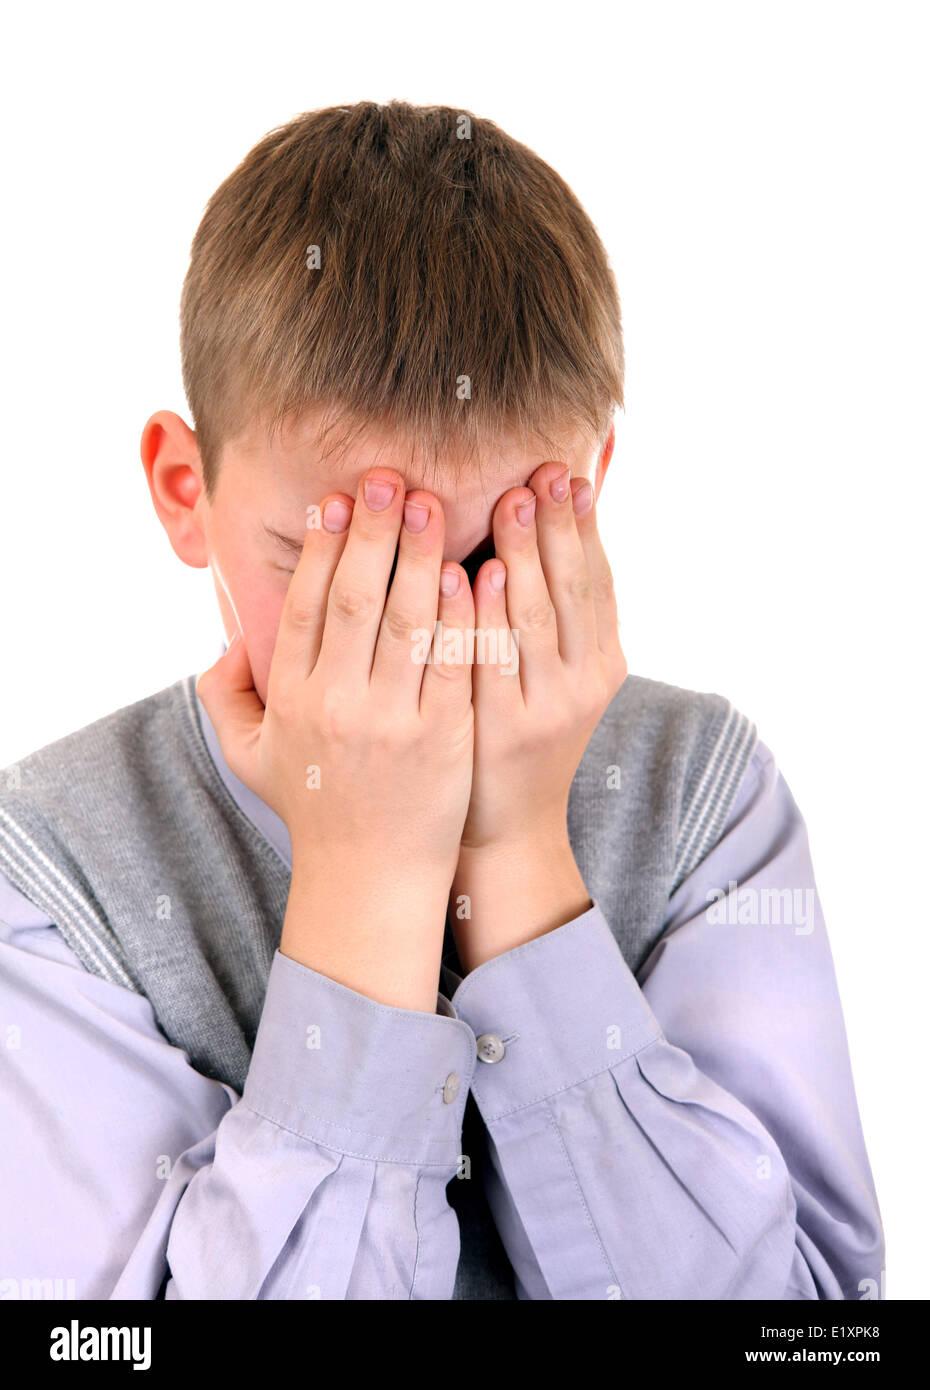 Sorrowful Boy - Stock Image